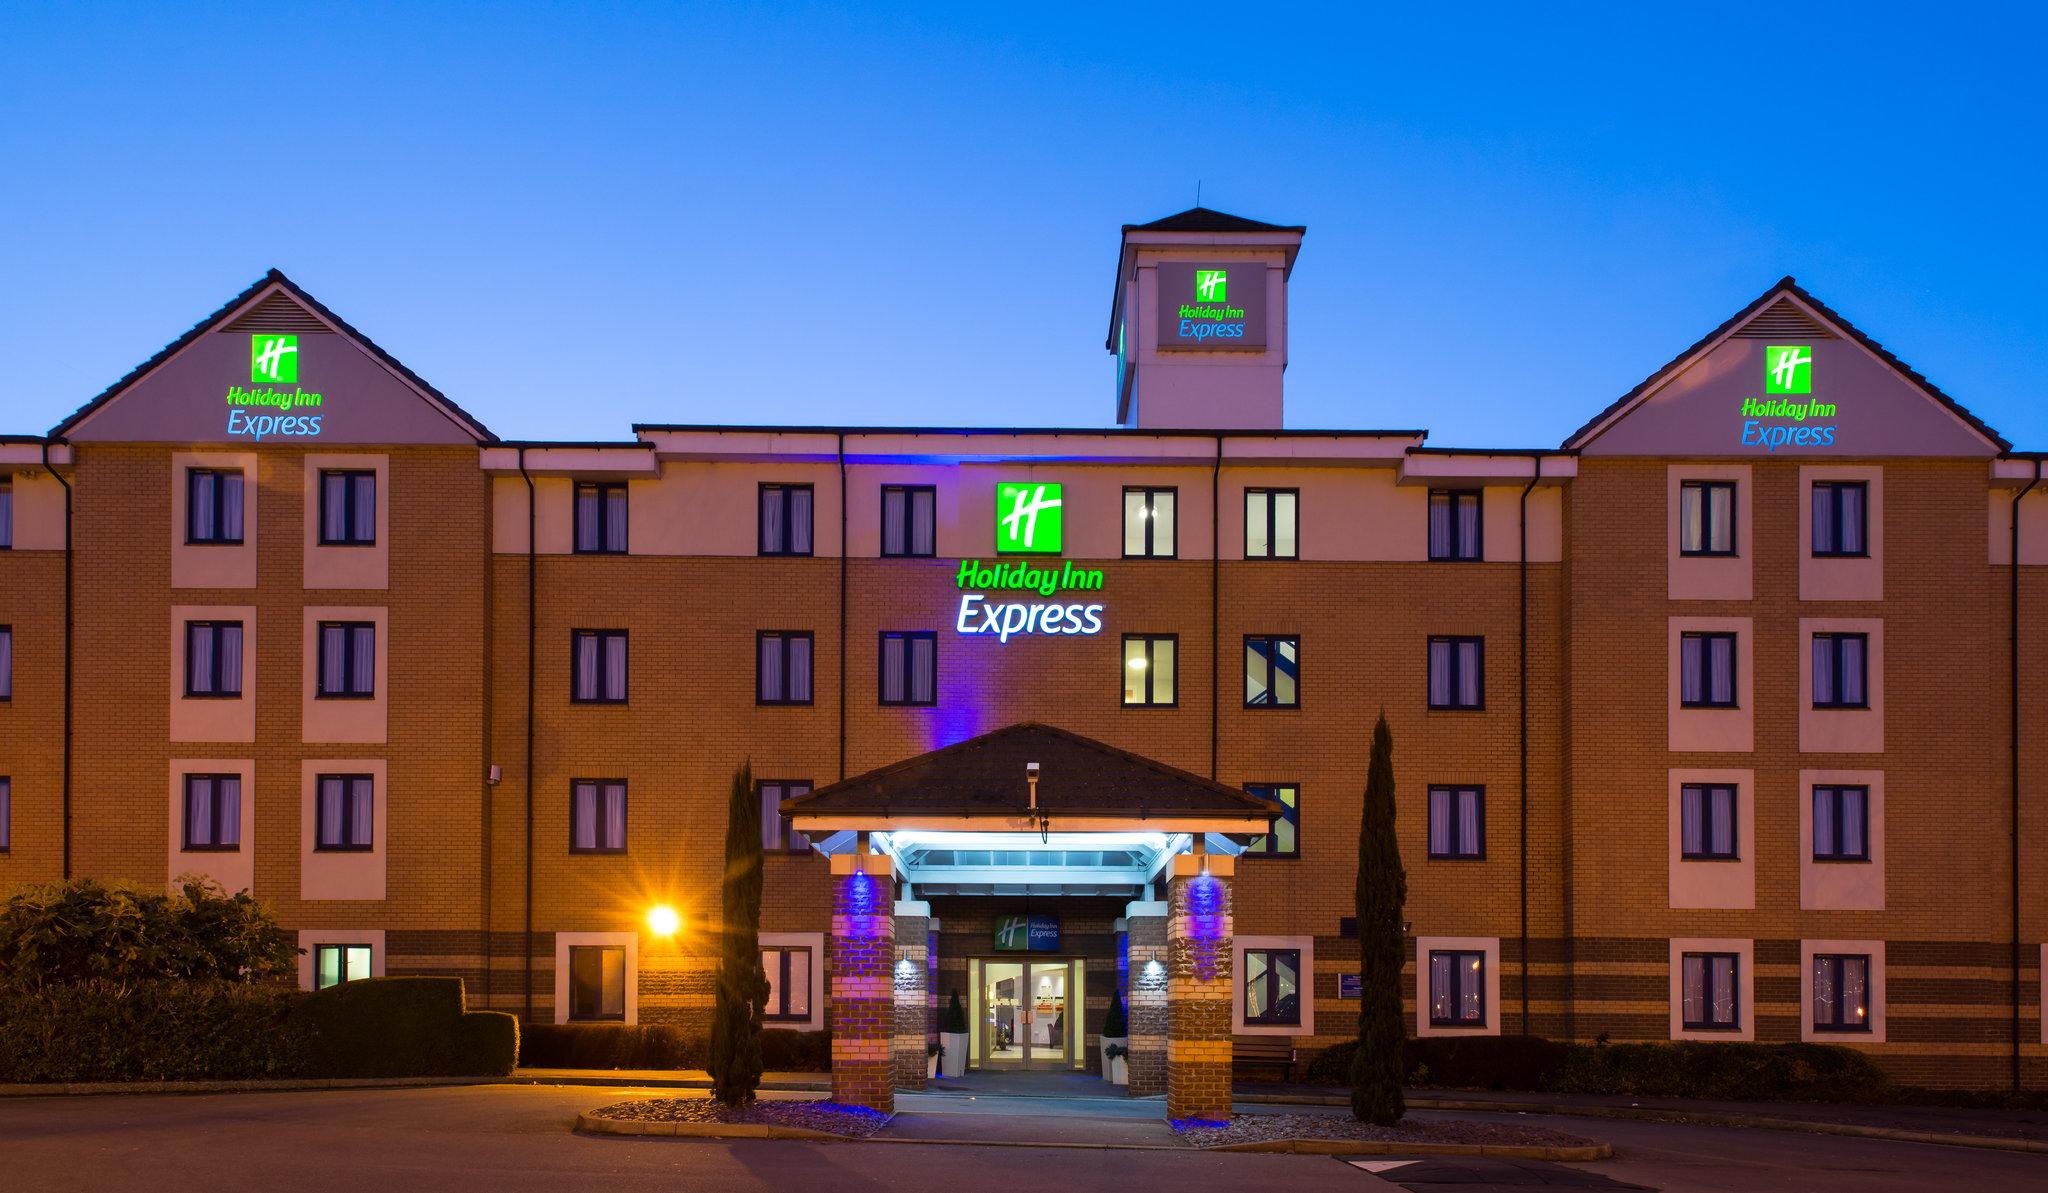 Holiday Inn Express Dartford Bridge